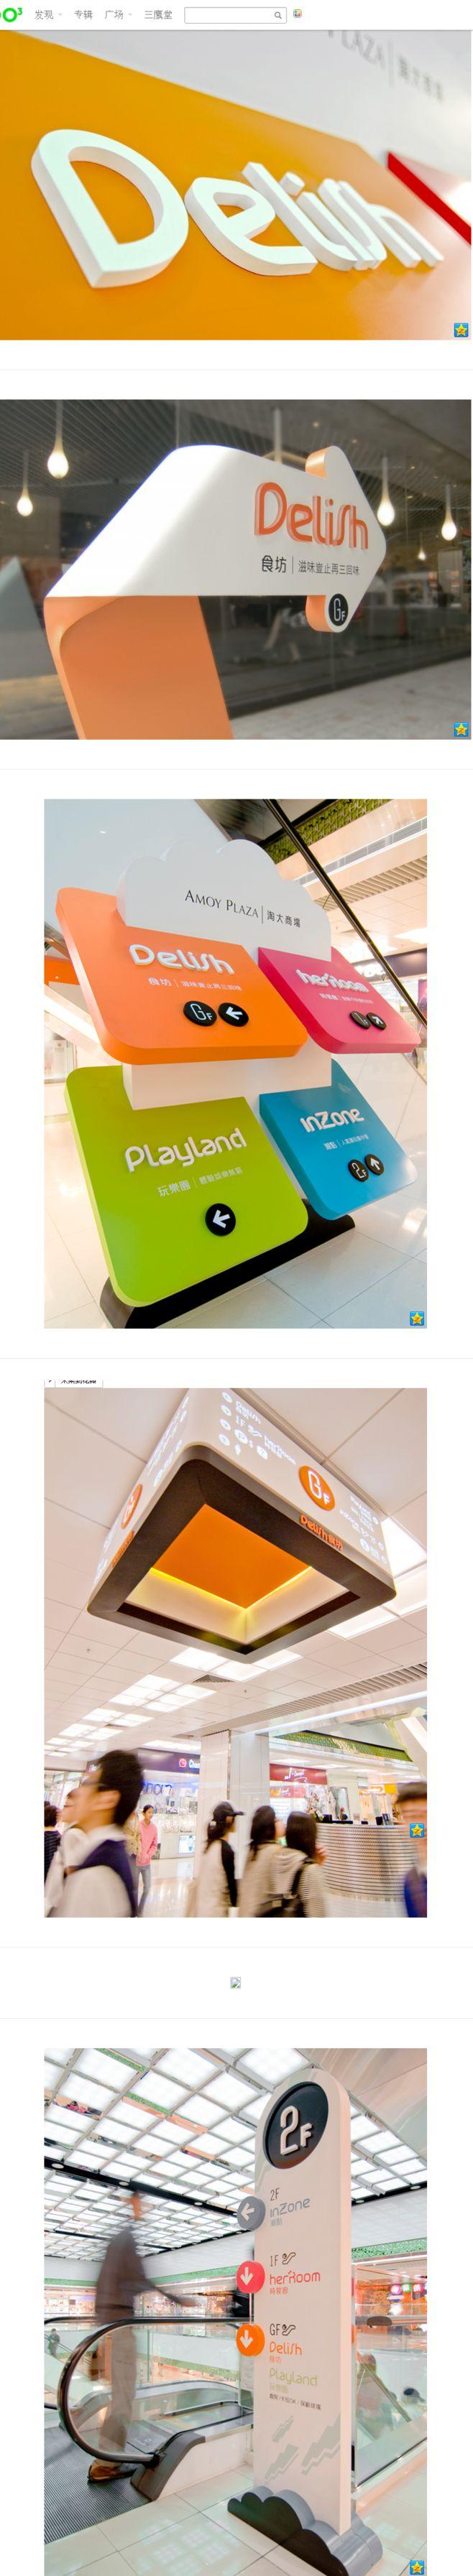 Creative and inventive signage #signage #graphic #design